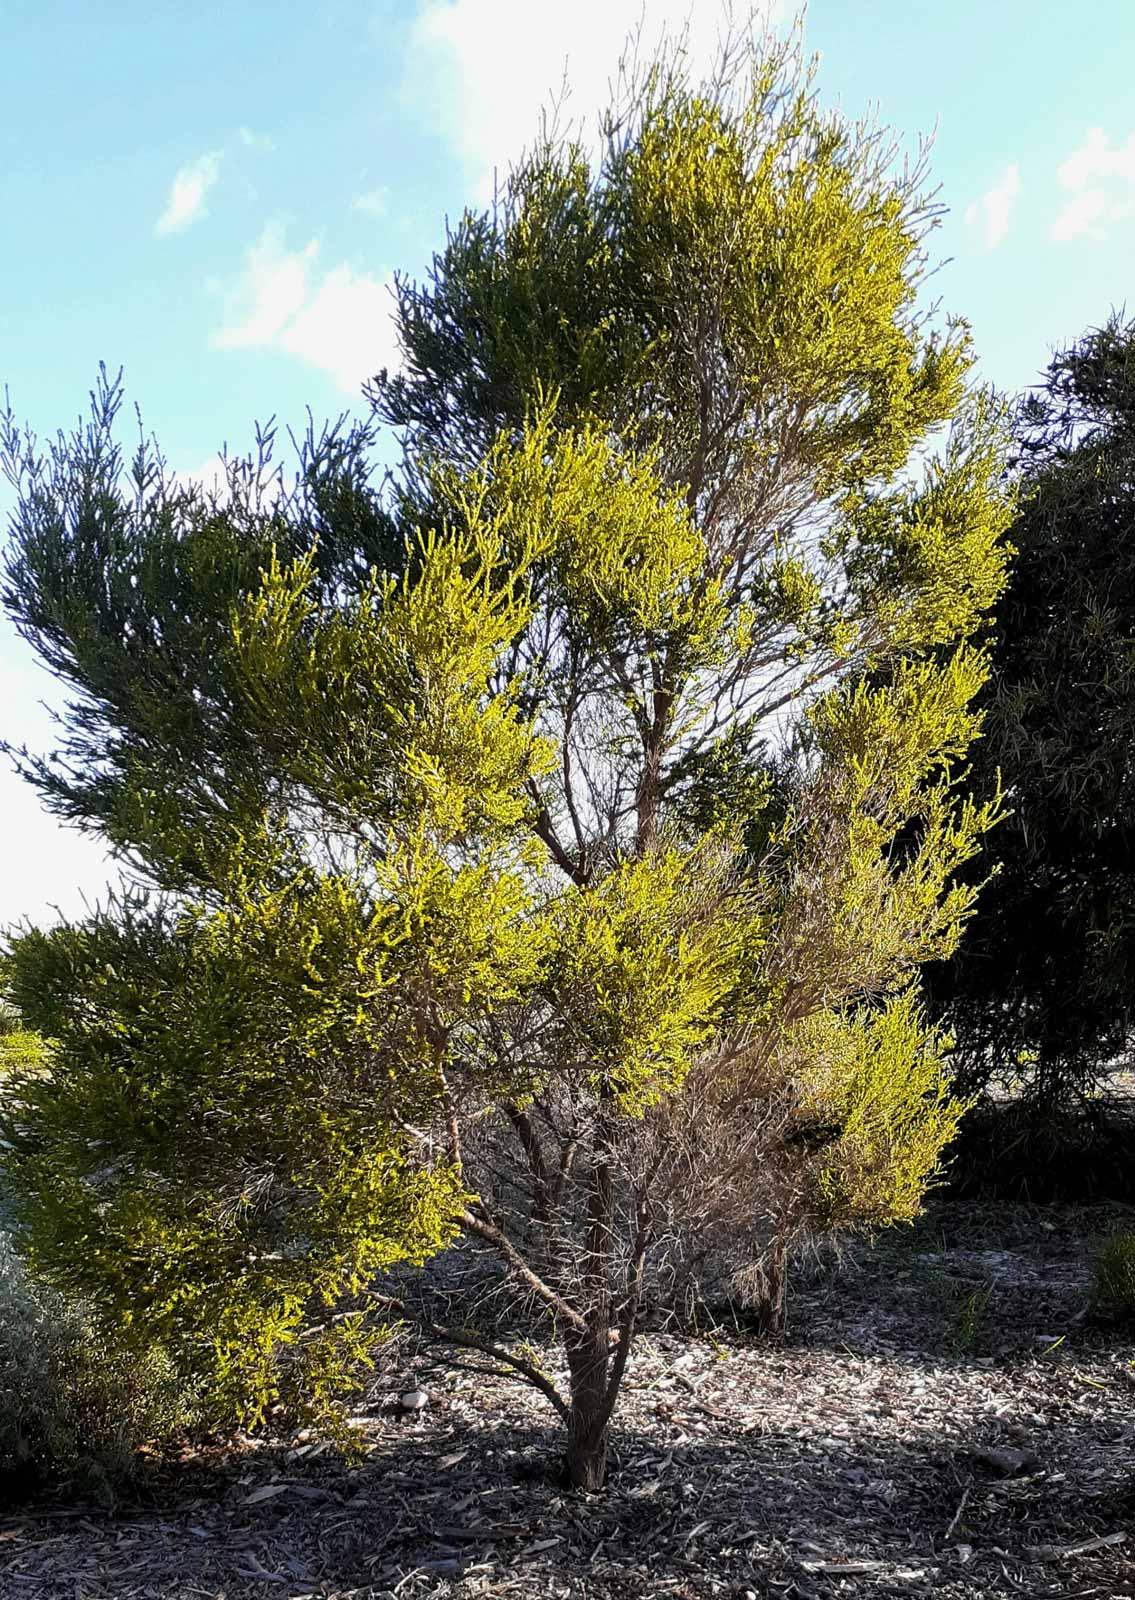 Chenille Honey Myrtle (Melaleuca huegelii)